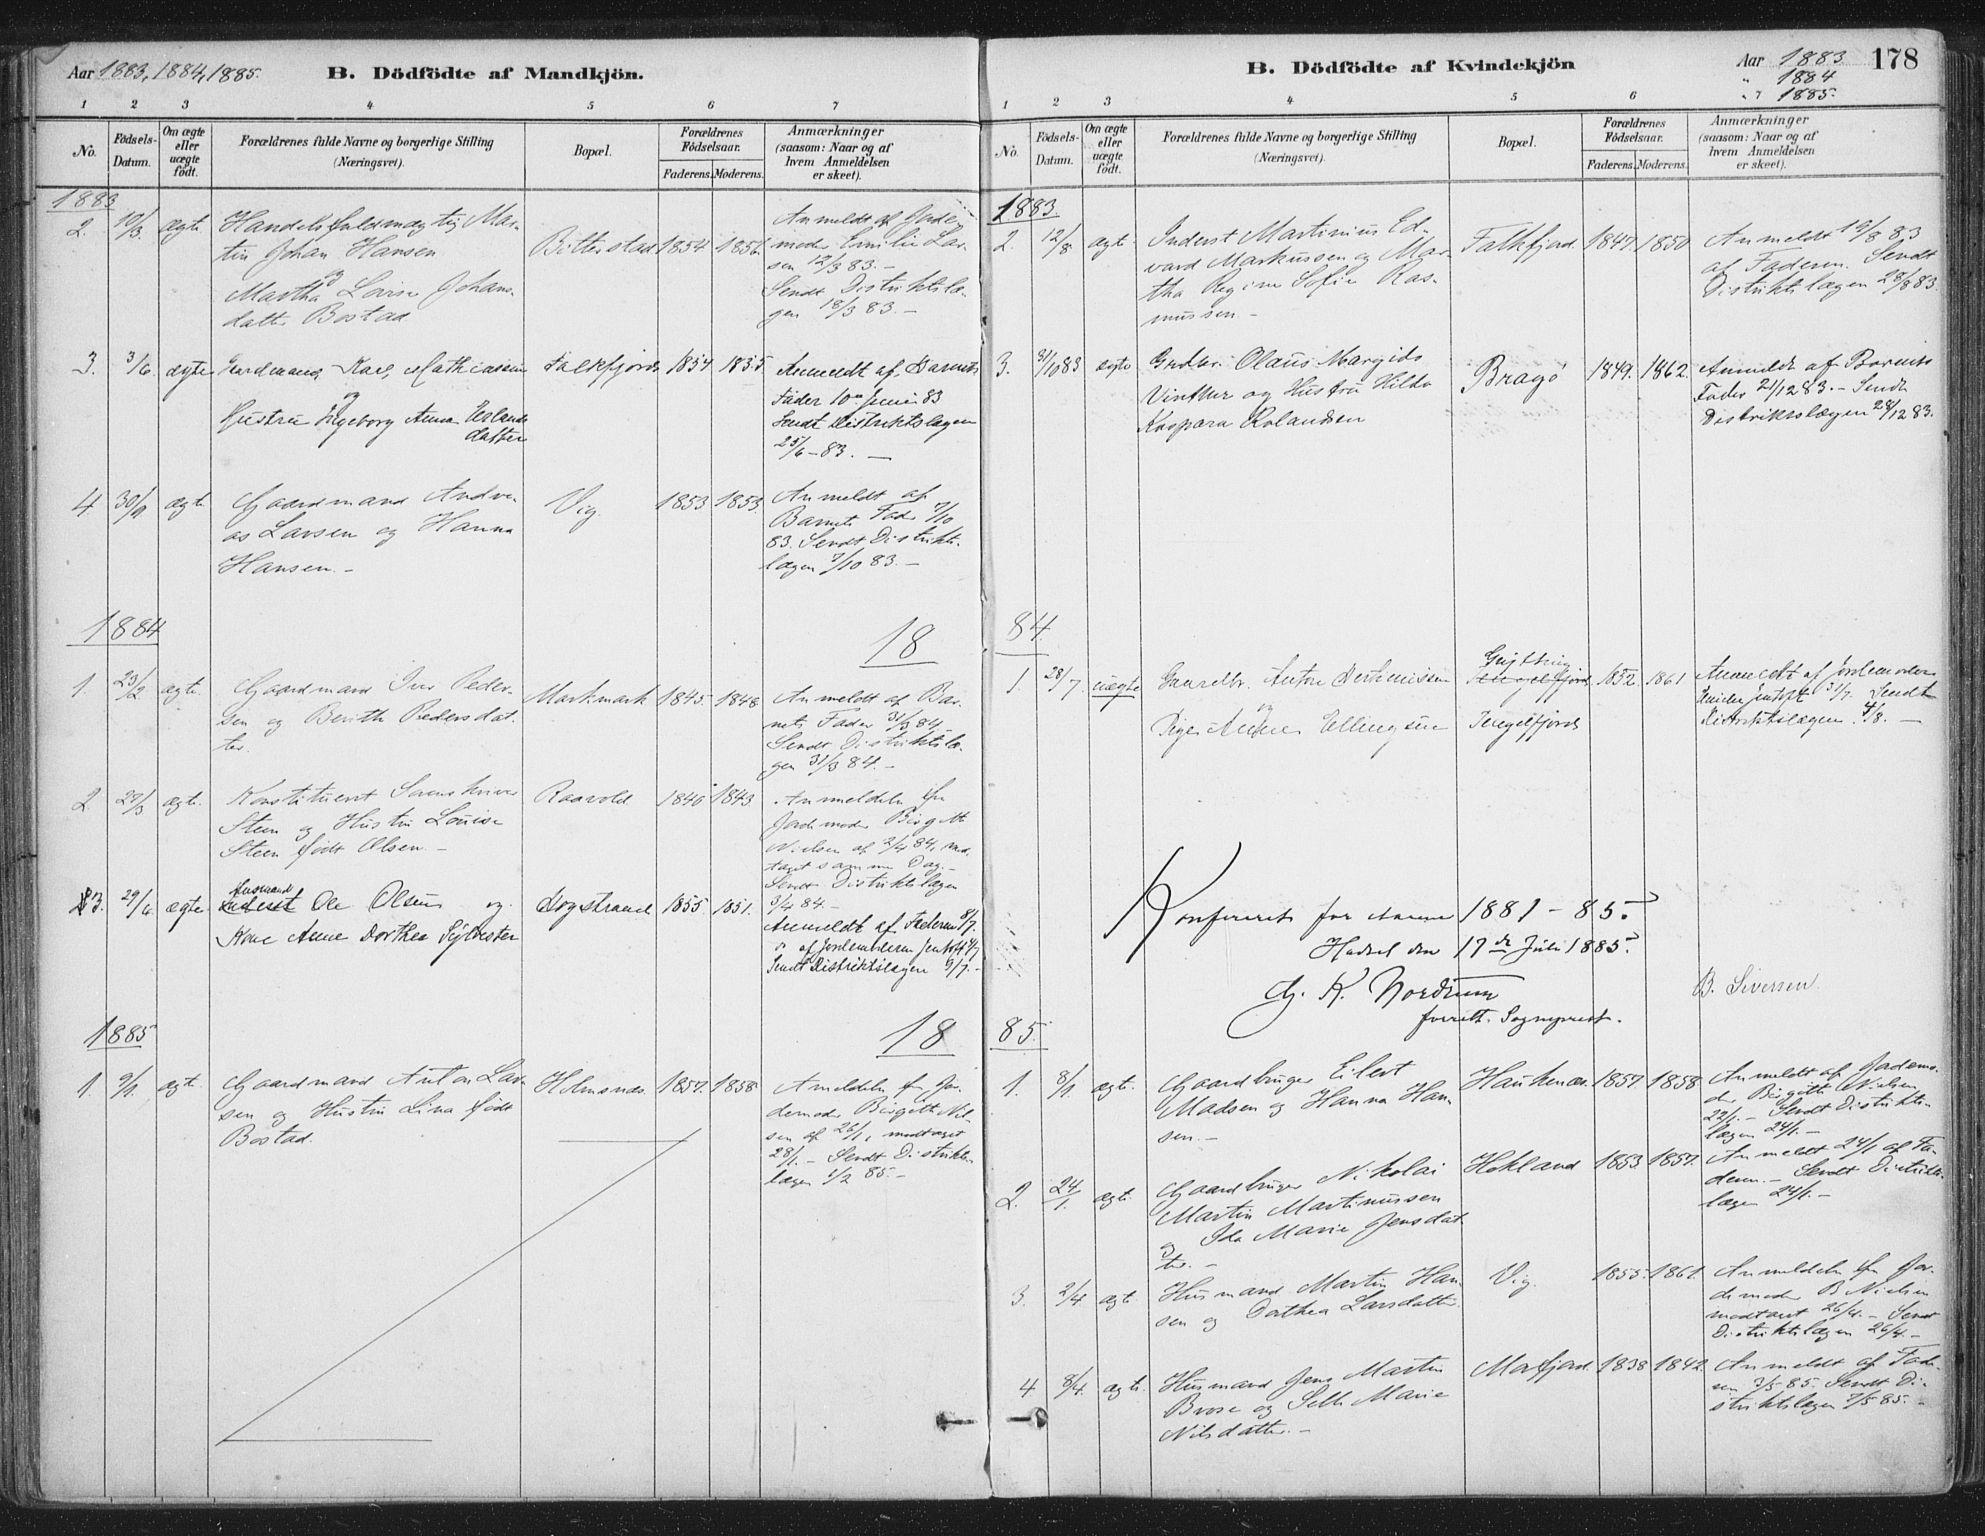 SAT, Ministerialprotokoller, klokkerbøker og fødselsregistre - Nordland, 888/L1244: Ministerialbok nr. 888A10, 1880-1890, s. 178